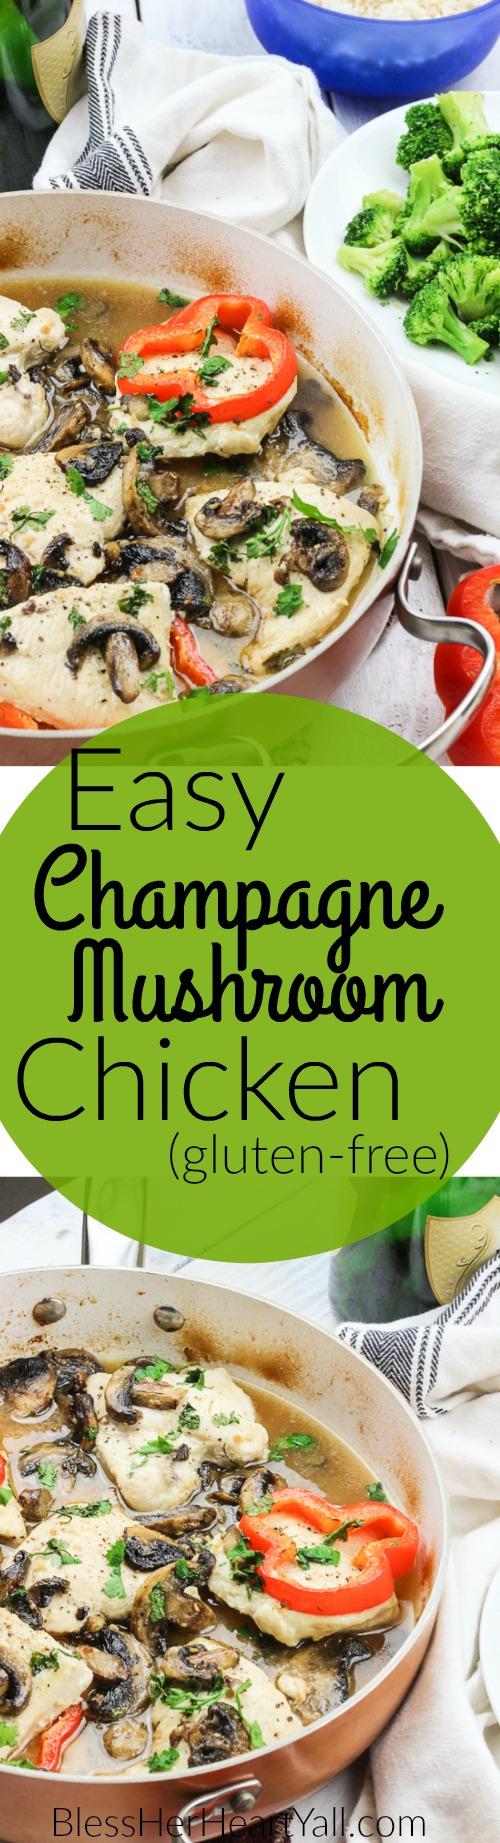 champagne mushroom chicken long pin 2